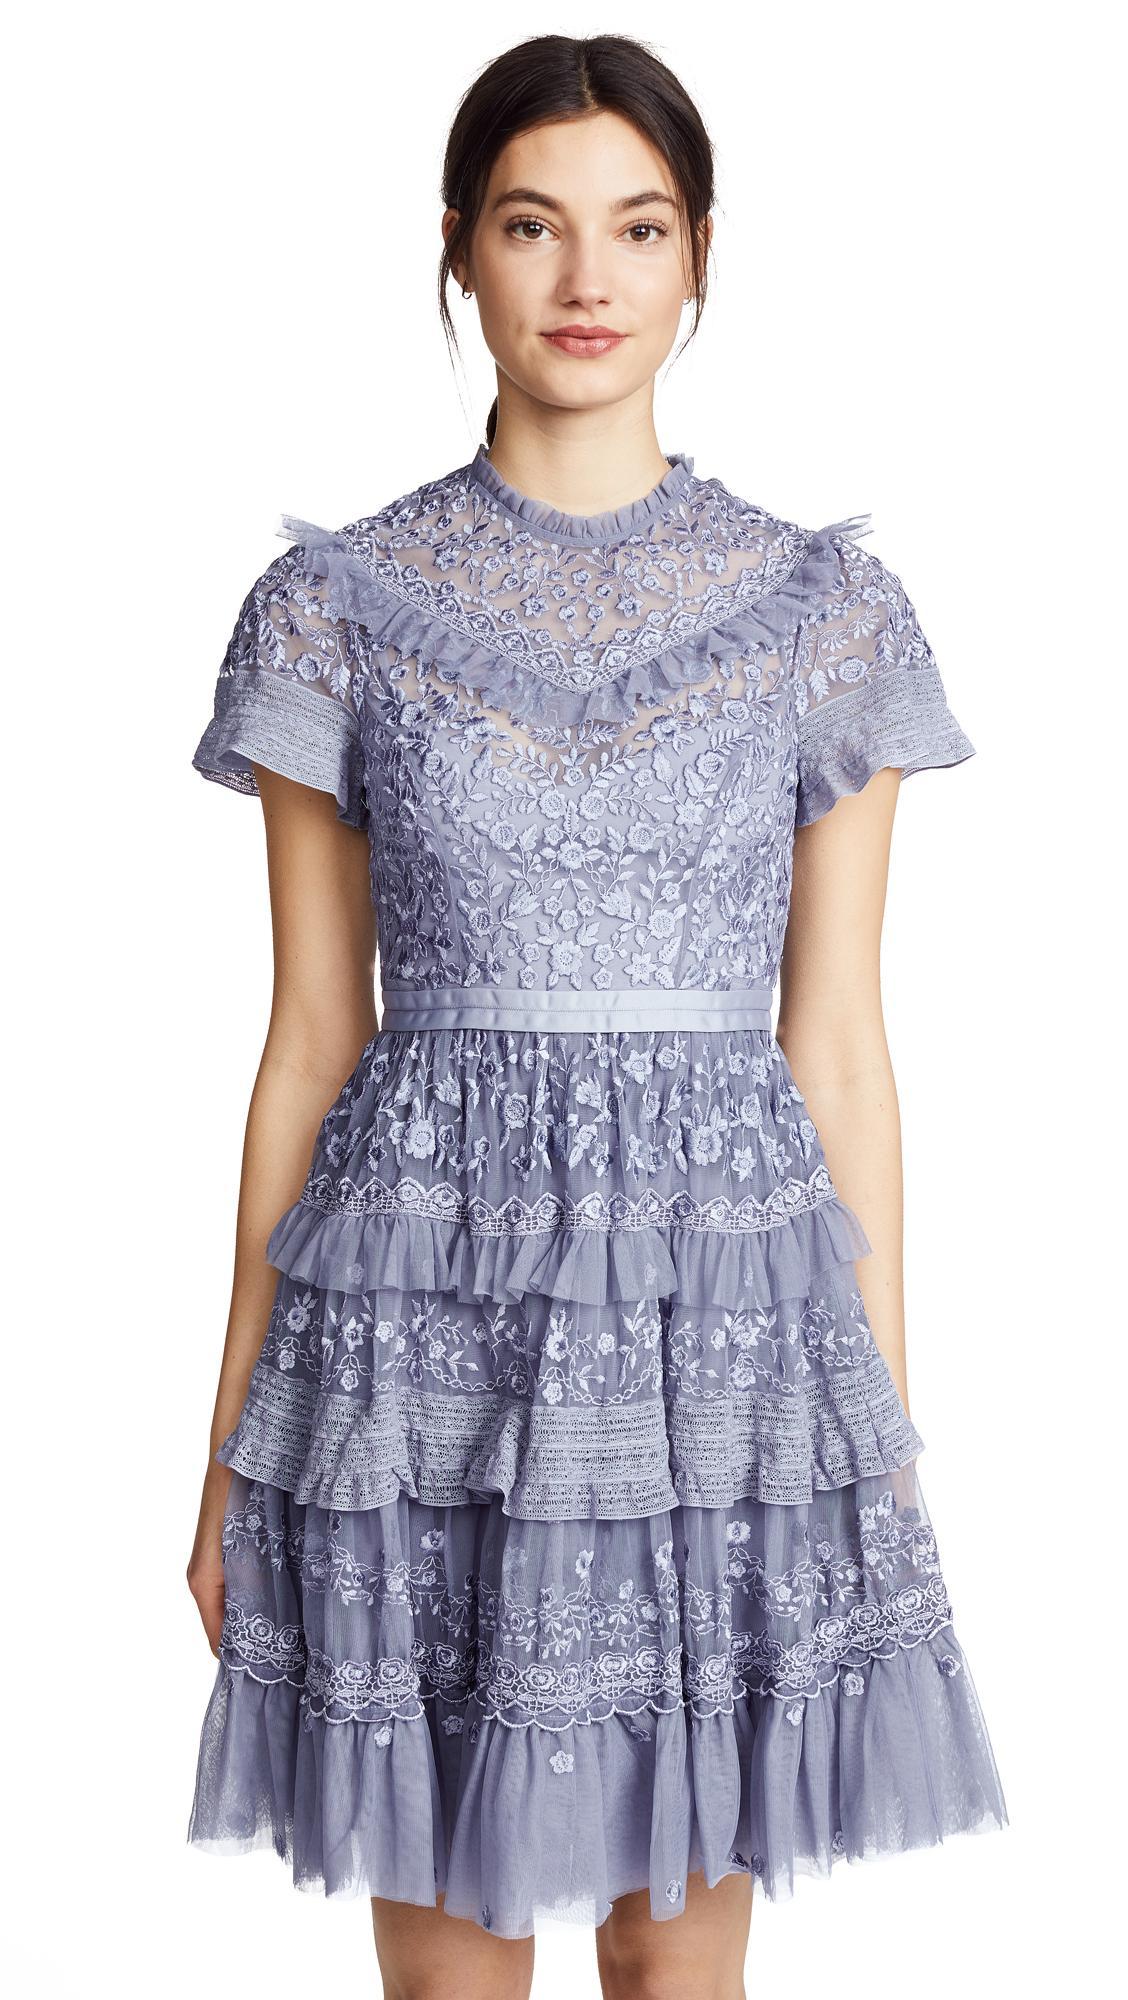 Needle & Thread Iris Dress In Lavender